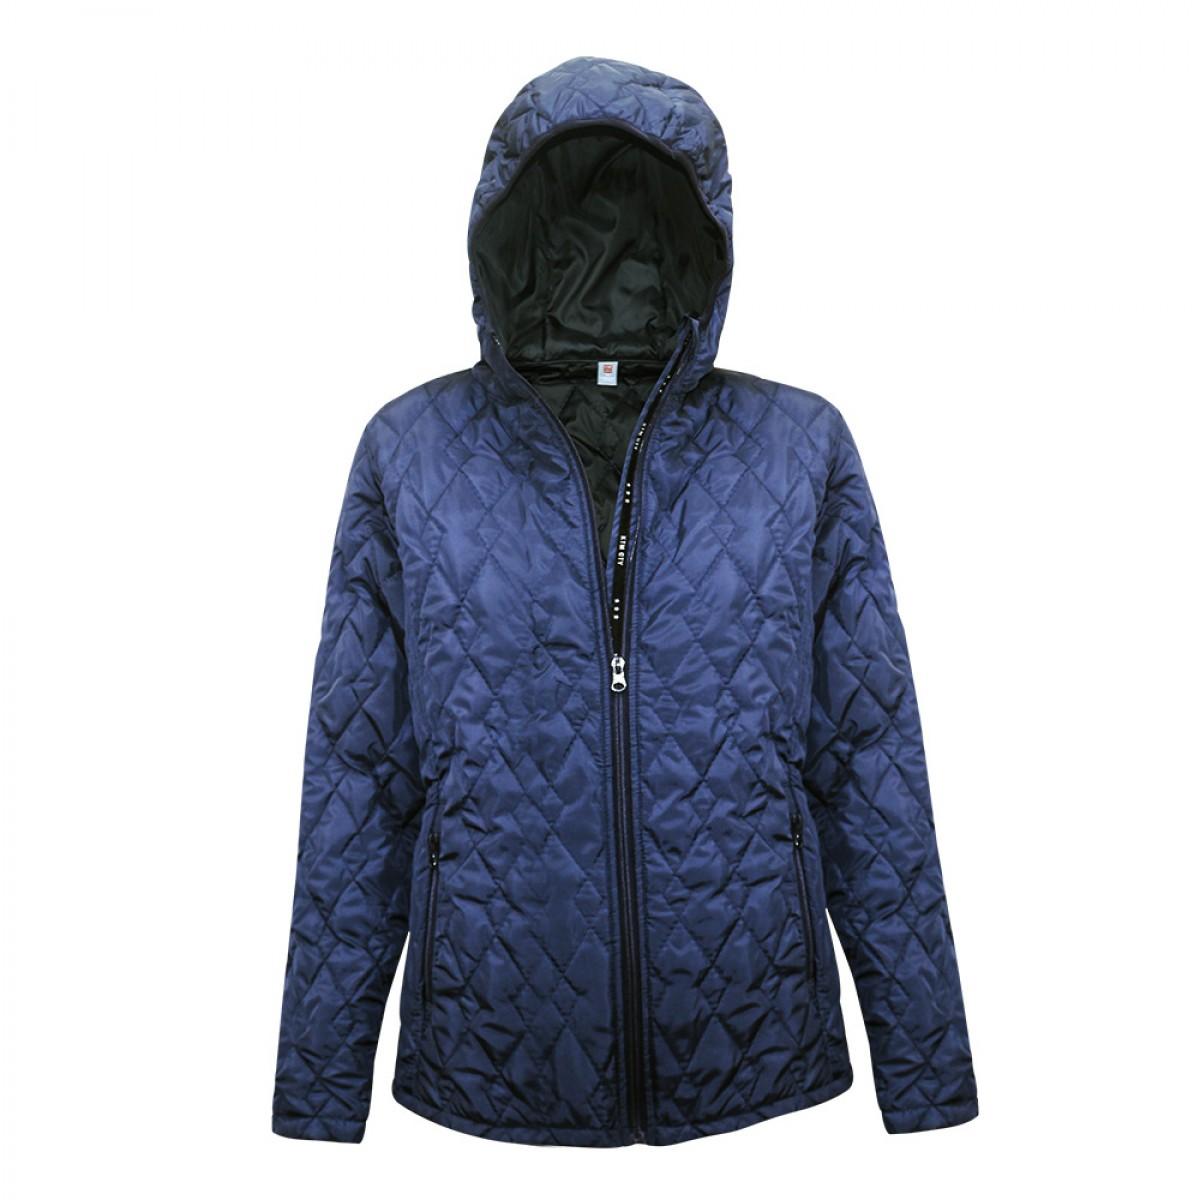 women-polyfiber-jacket-with-hoodie-kpj06913-5a